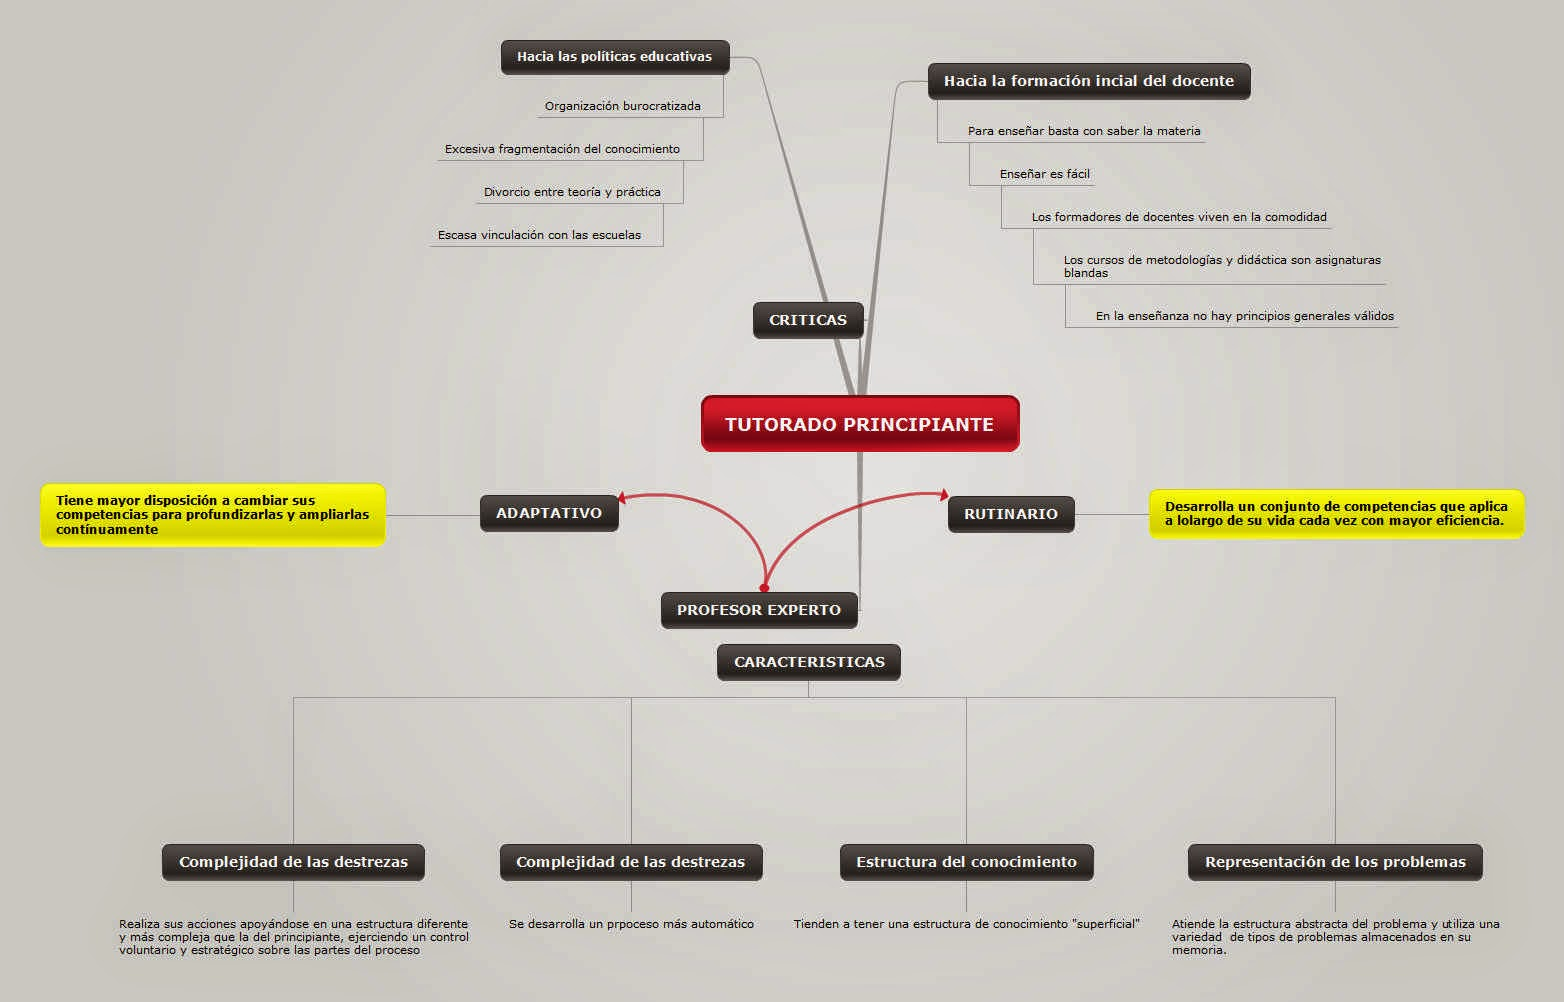 http://www.mindomo.com/mindmap/esquema-tutorado-principiante-rubn-rt-f88bfd89d32c0457adc860fc77a39363